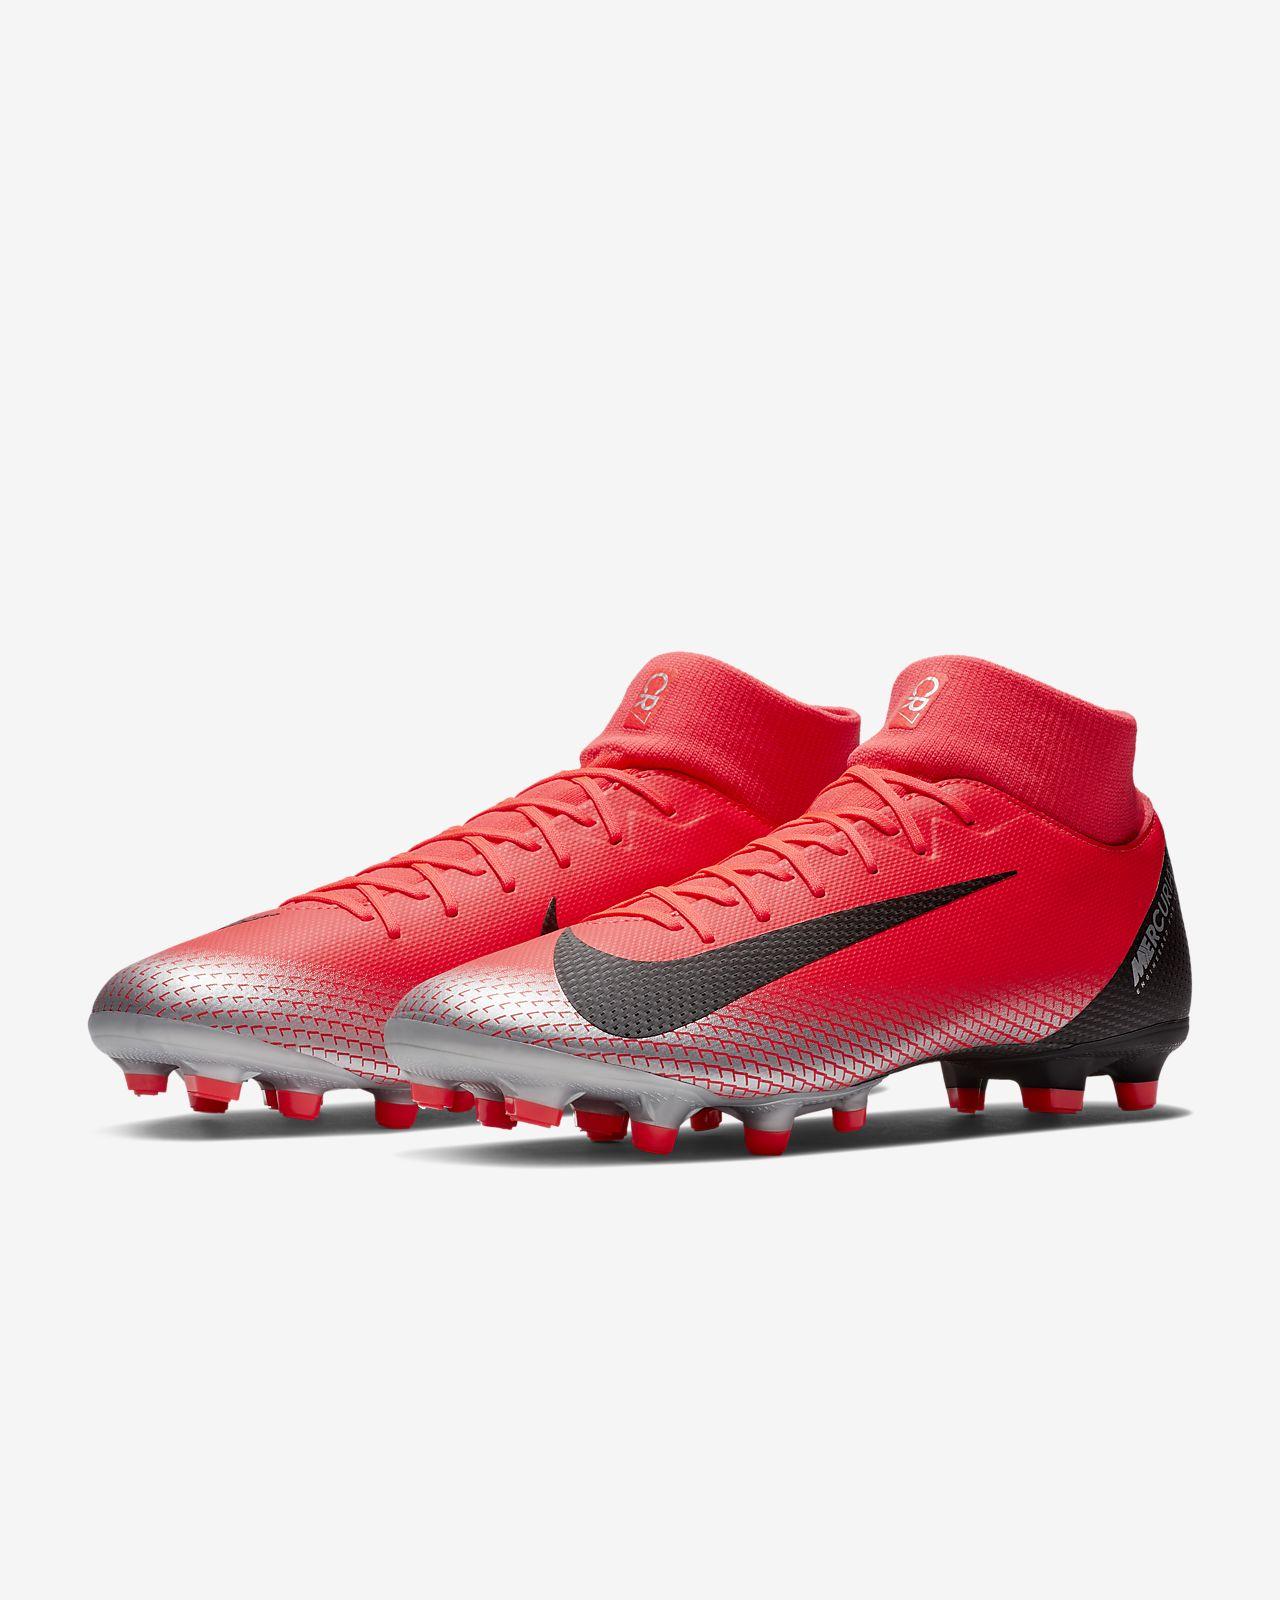 6ac6f3bcdcdce2 Nike Mercurial Superfly 6 Academy CR7 MG Multi-Ground Football Boot ...